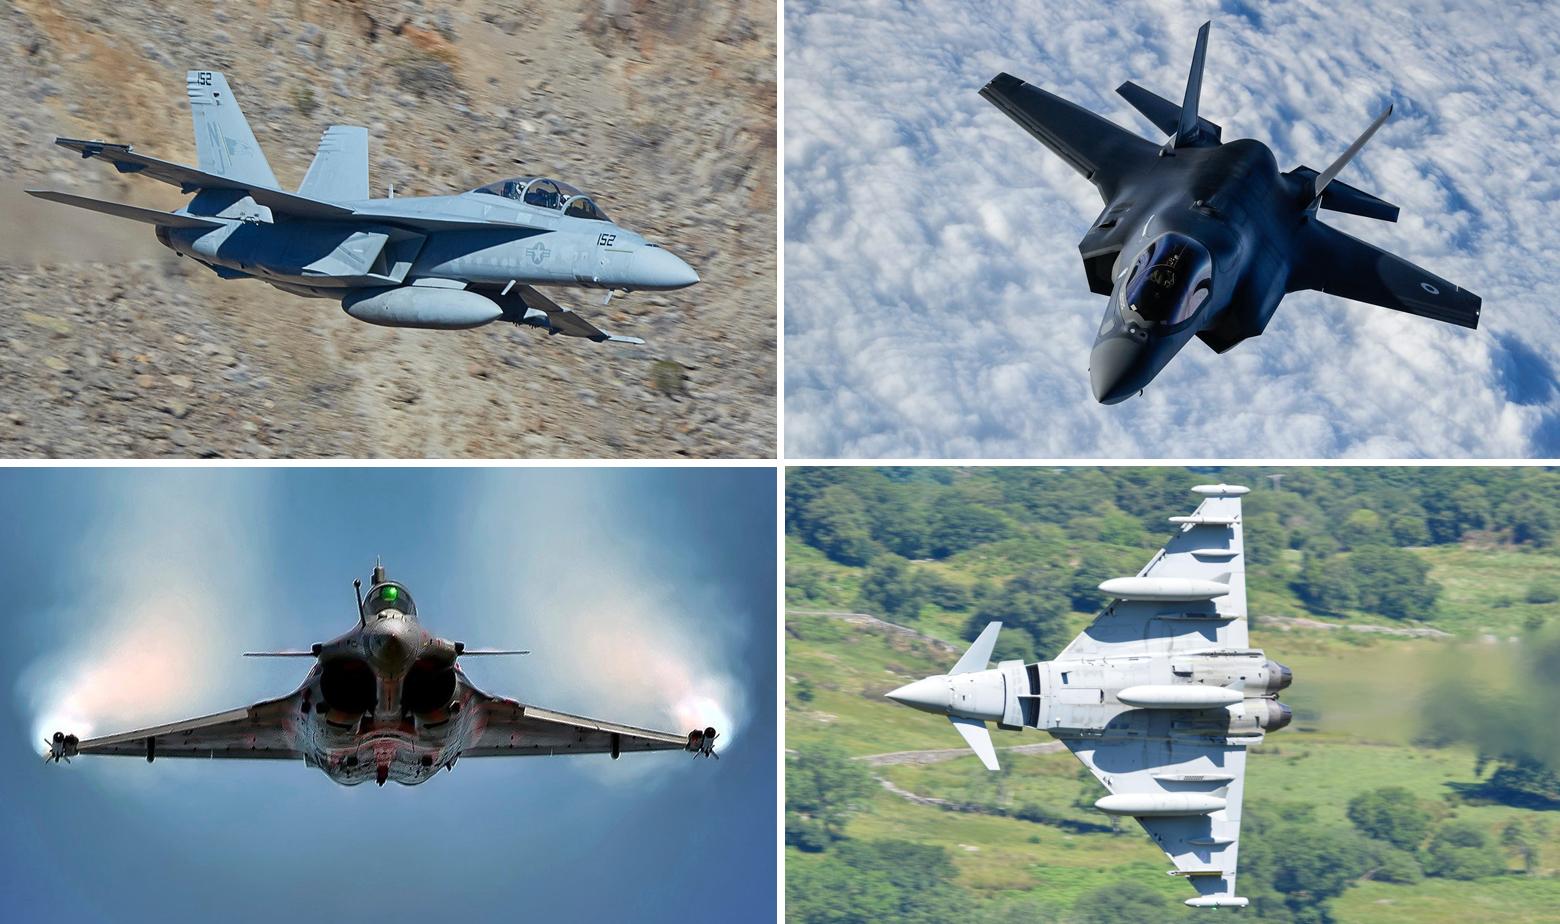 F/A-18 Super Hornet, F-35B, Dassault Rafale i Eurofighter Typhoon